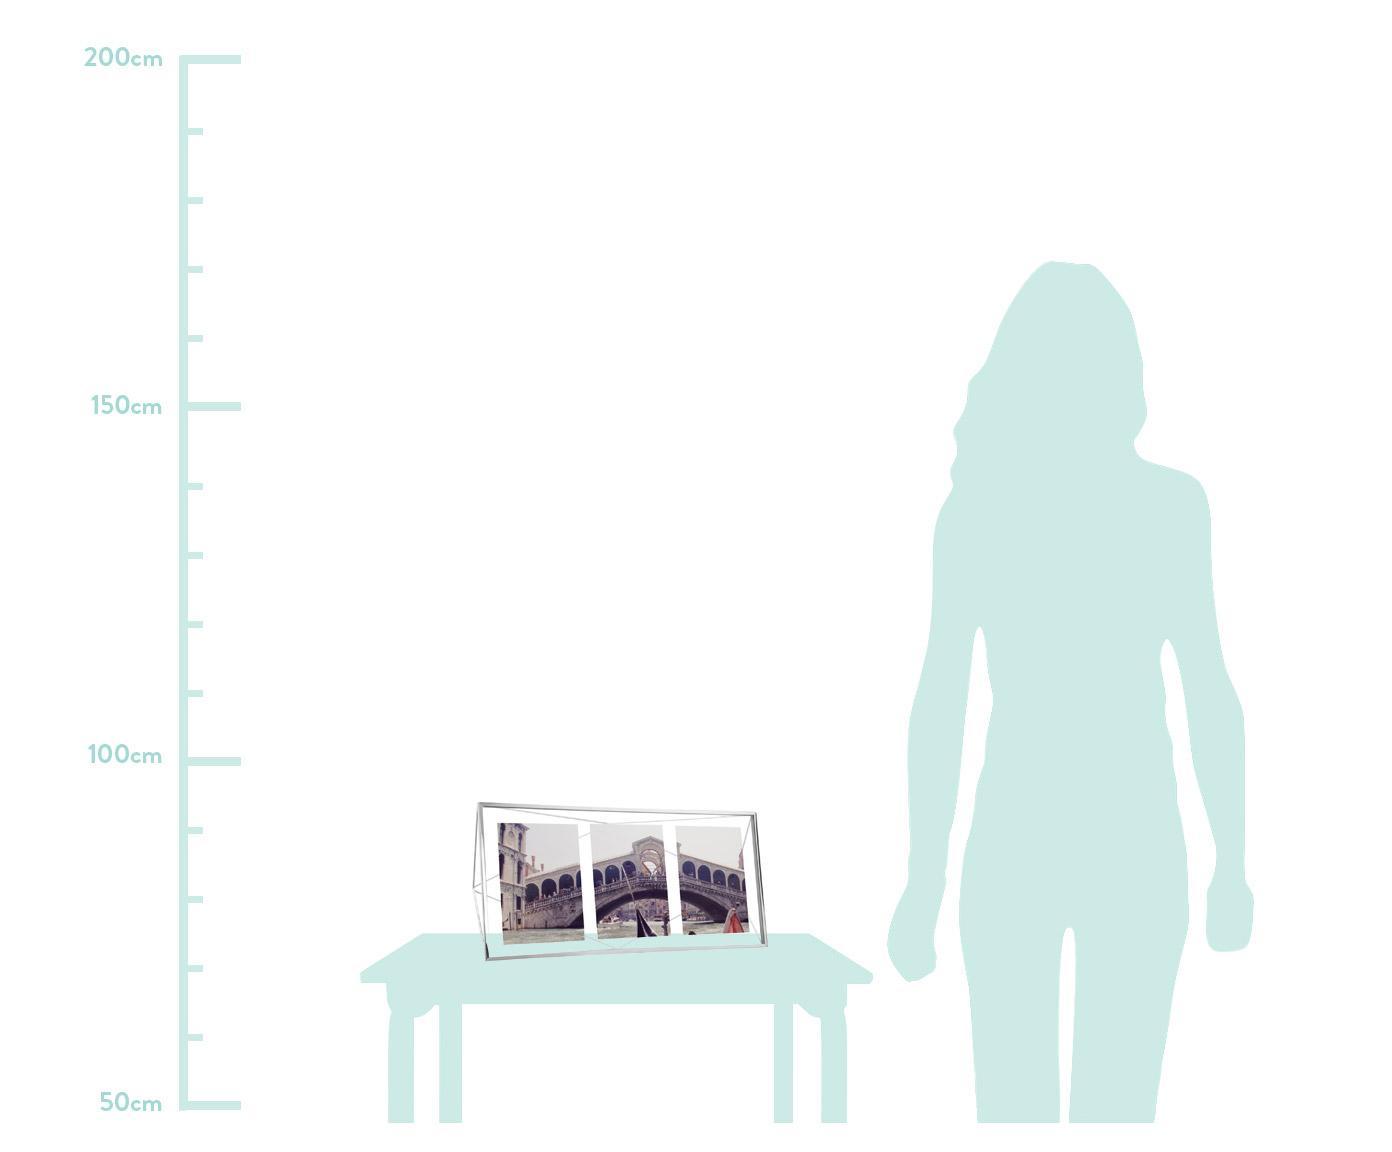 Ramka na zdjęcia Prisma, Chrom, 13 x 18 cm